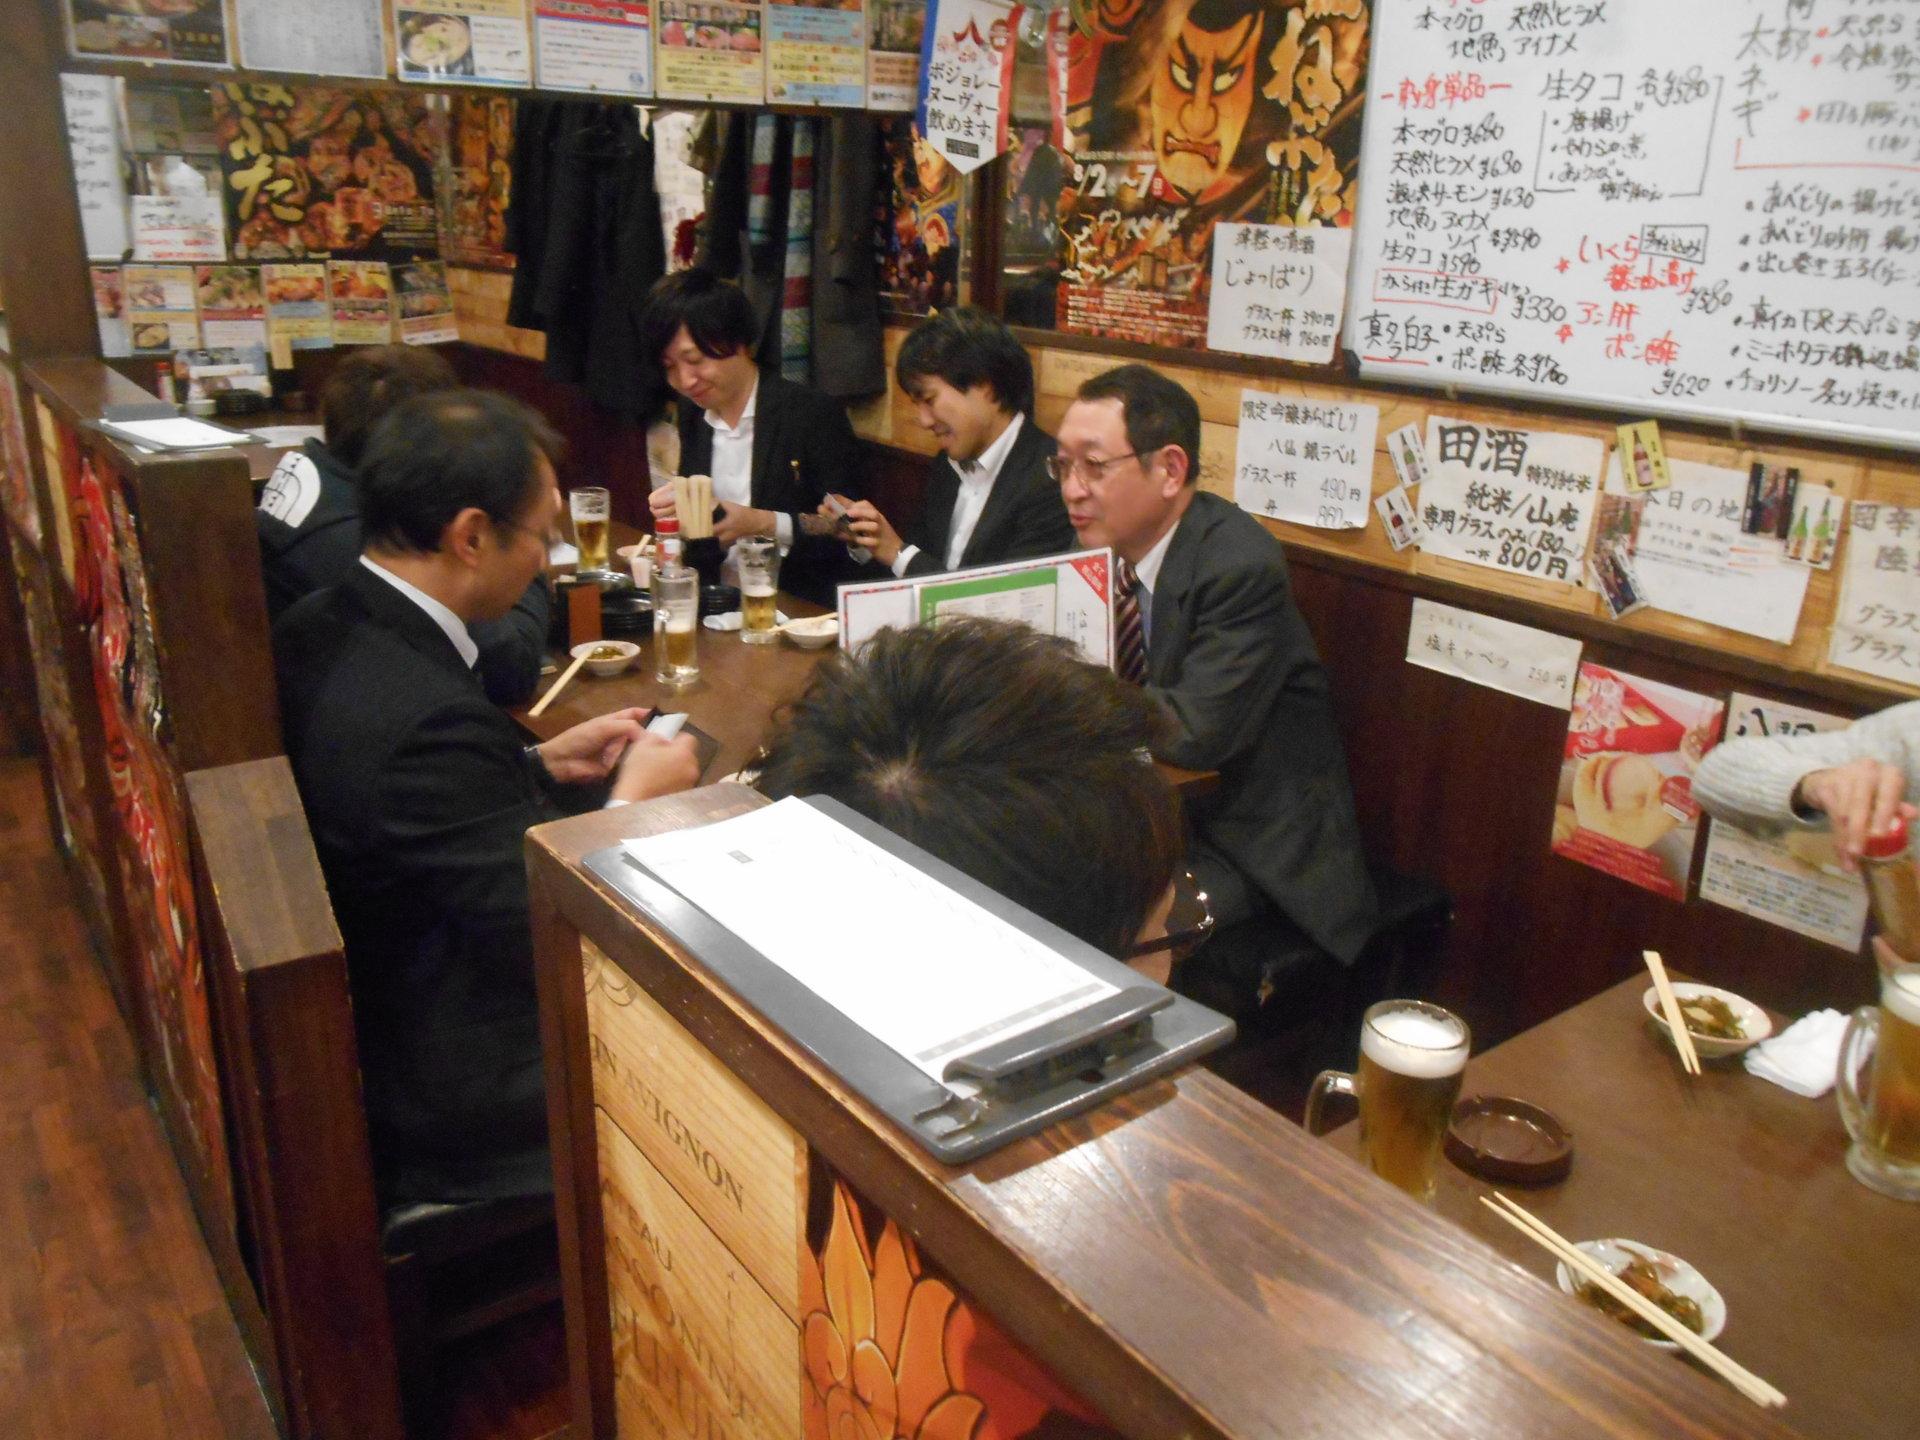 DSCN0595 1920x1440 - 2015年12月21日(月) AOsuki忘年会開催しました。